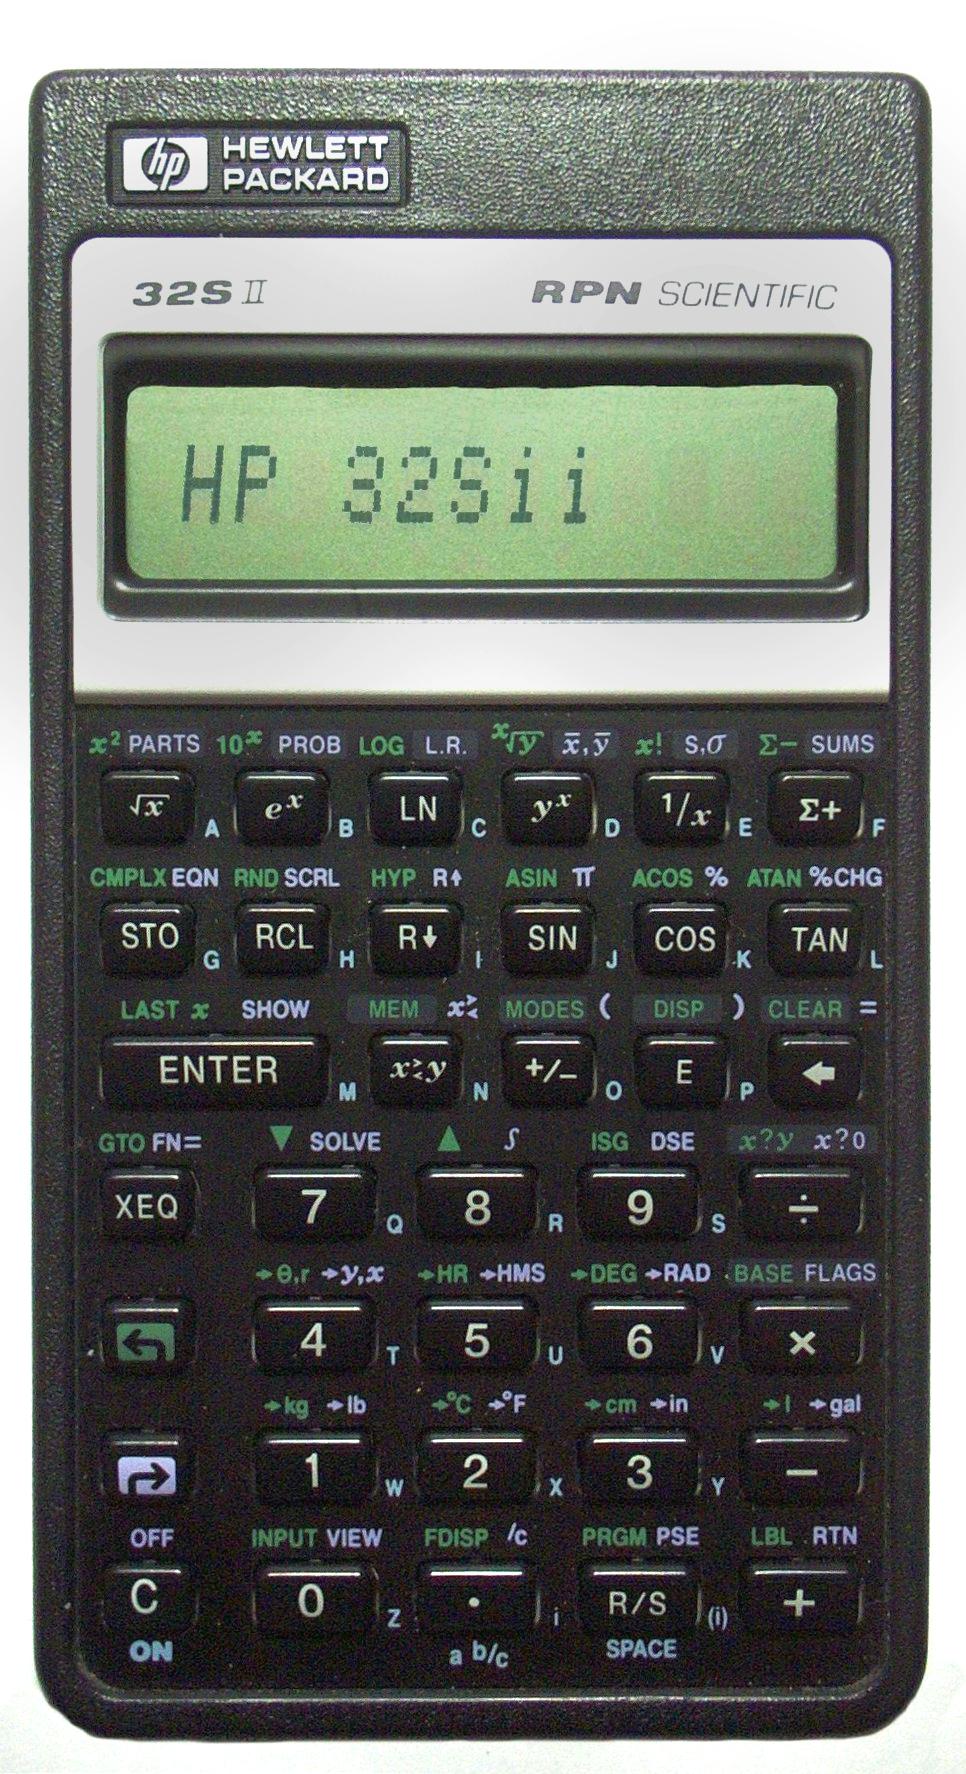 hp 32s wikipedia rh en wikipedia org Hewlett-Packard Scientific Calculators in 1972 Hewlett-Packard Support Calculator